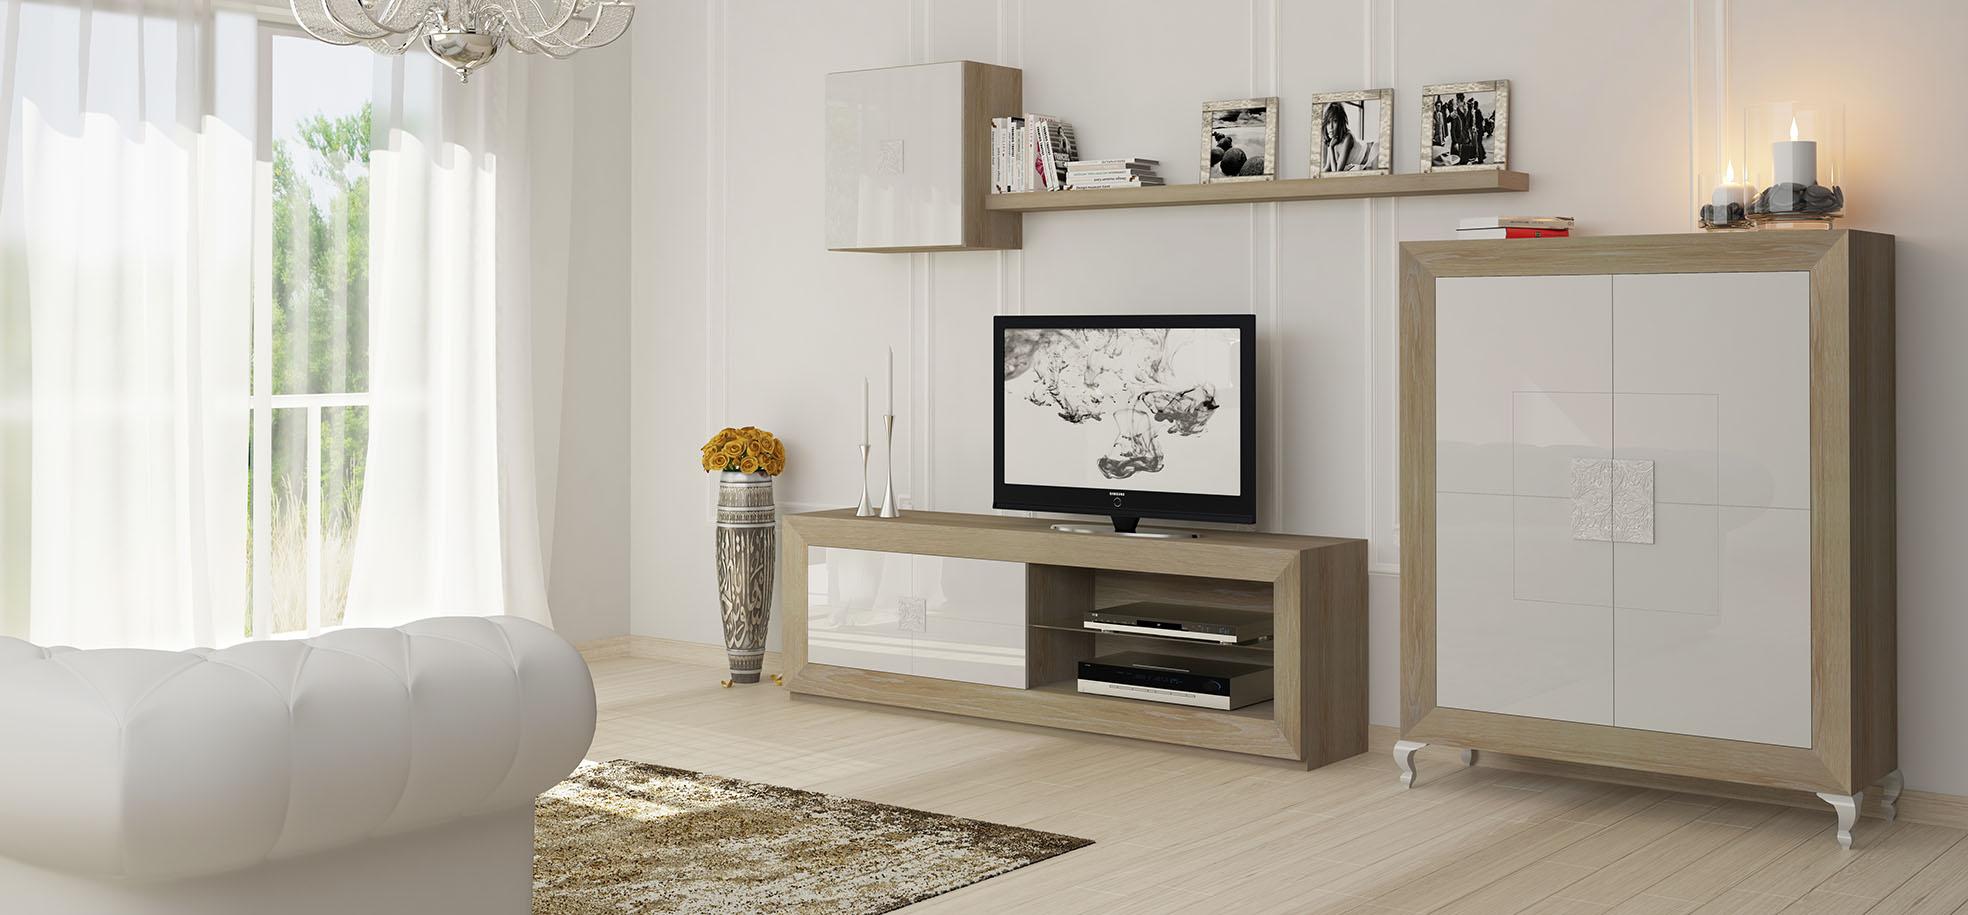 salon-contemporaneo-Basik-muebles-paco-caballero-1231-5c93923bf021e